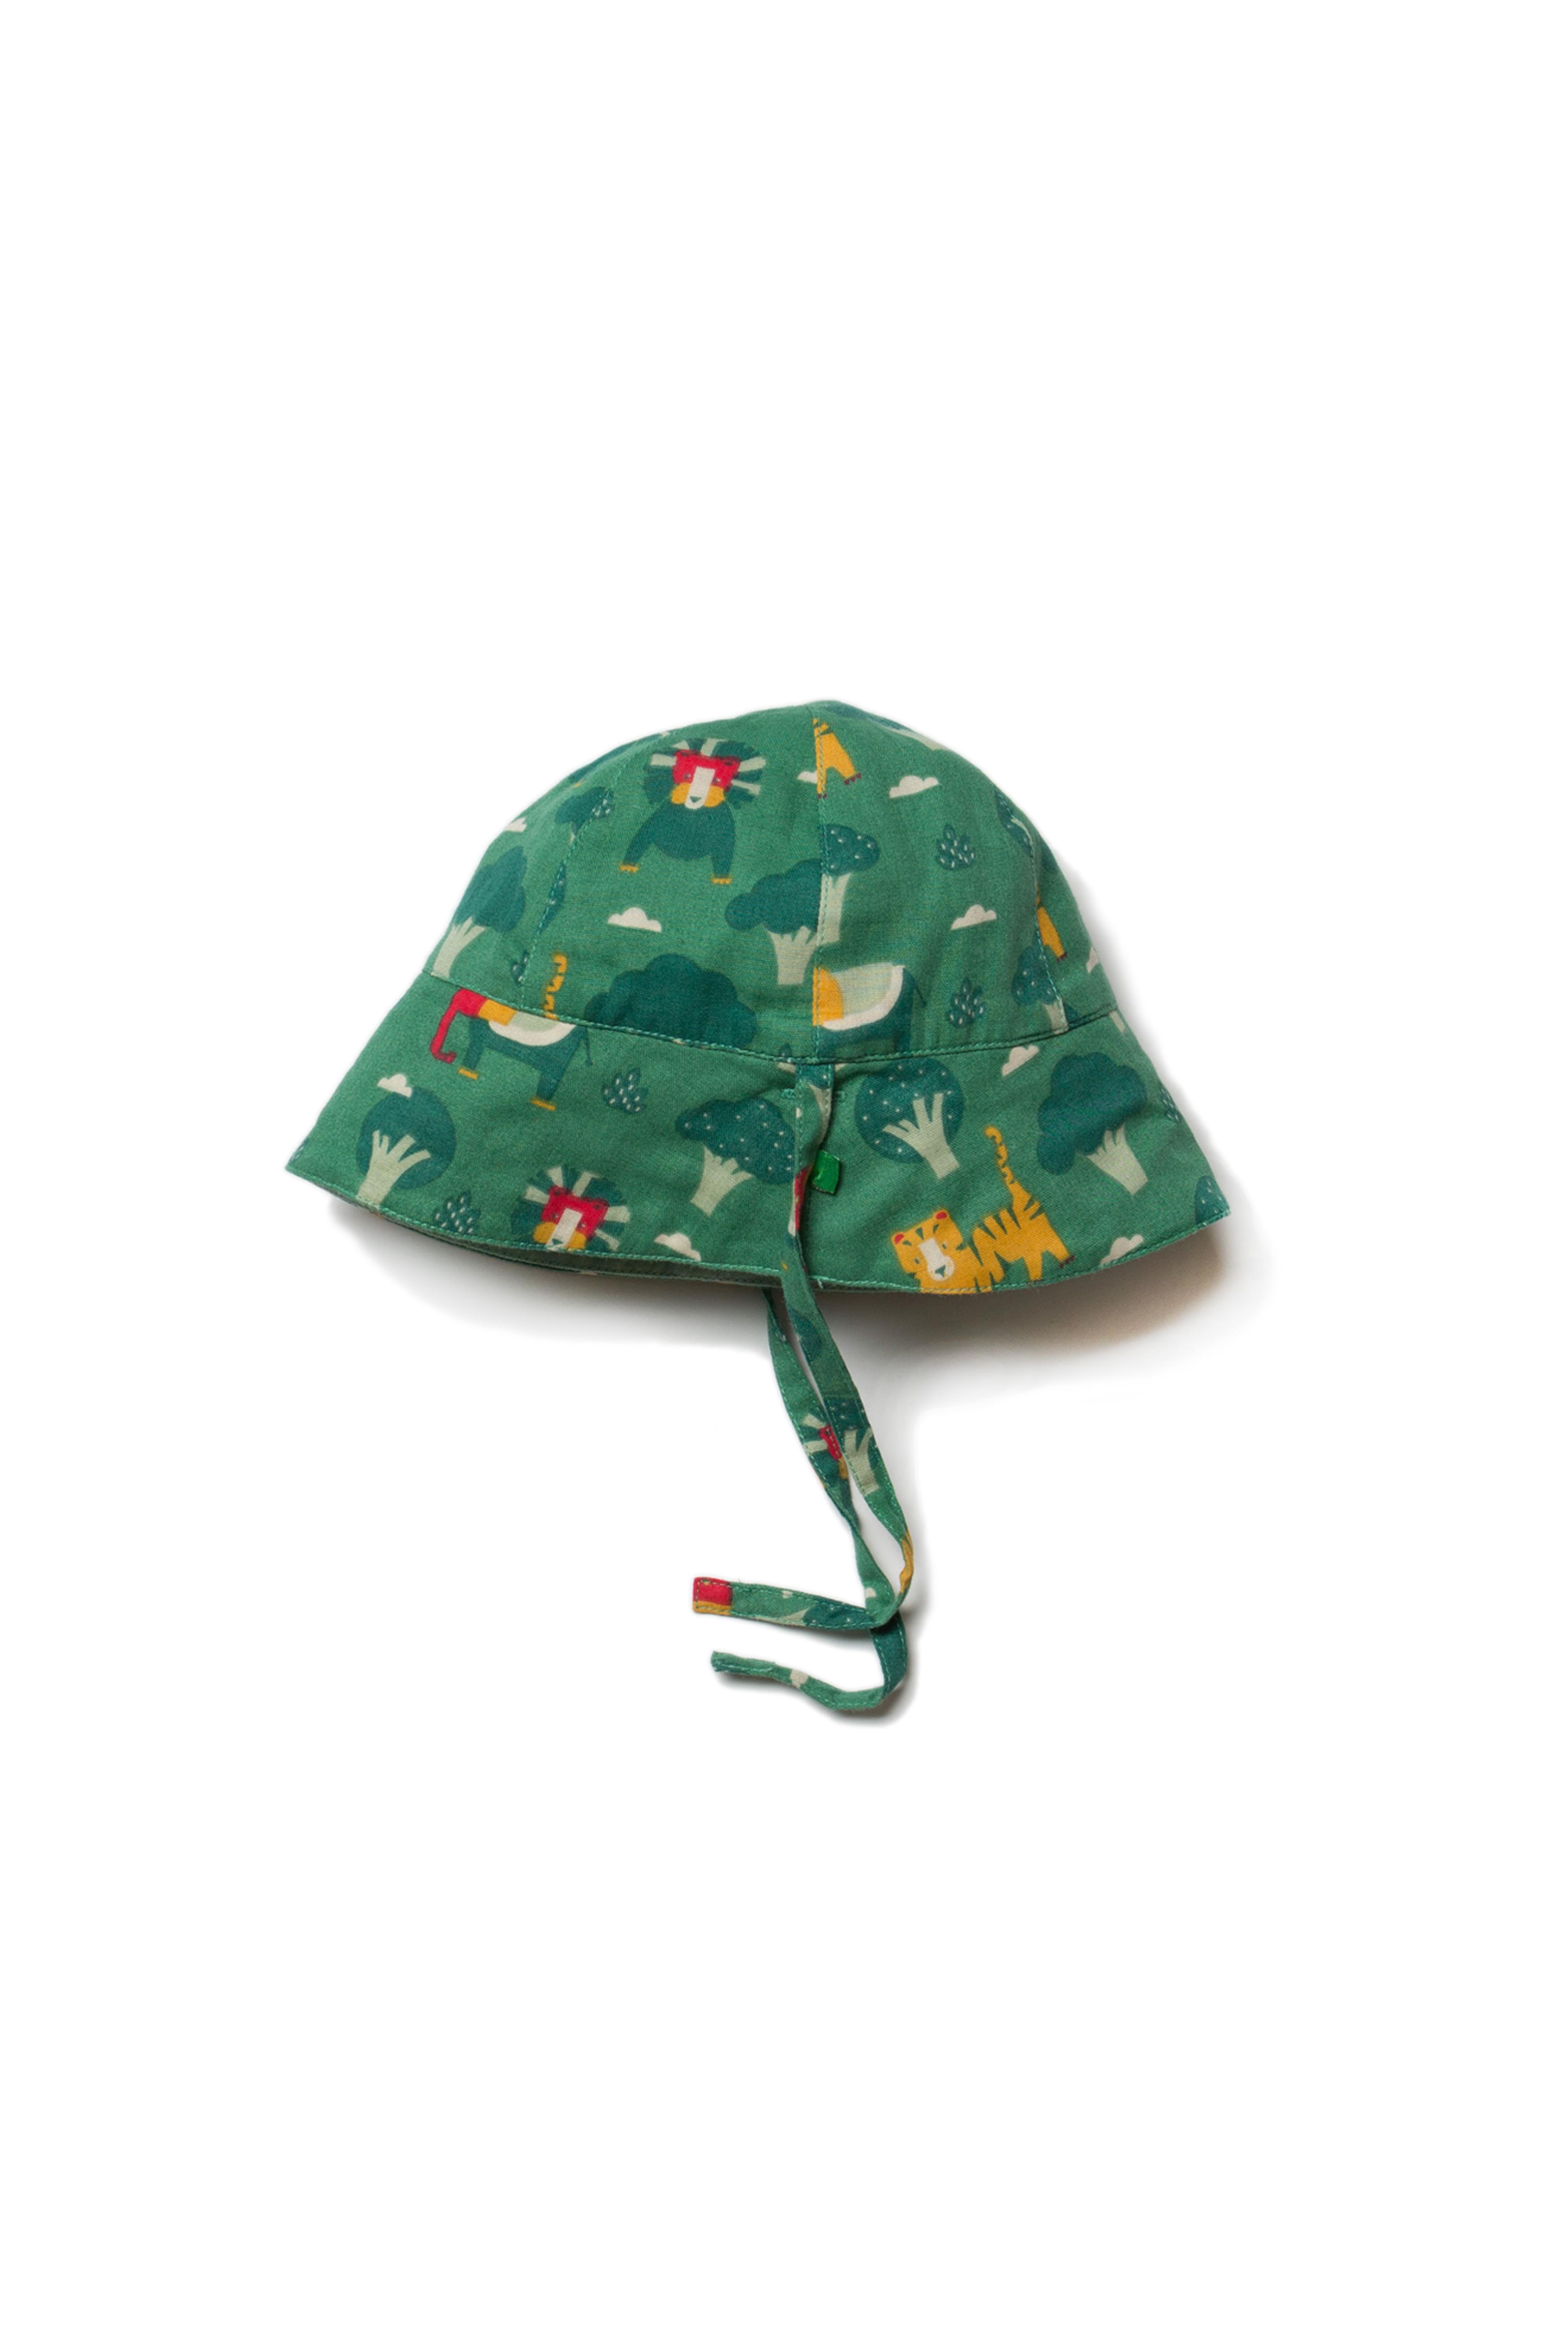 Little Green Radicals - jungle adventures reversible sun hat